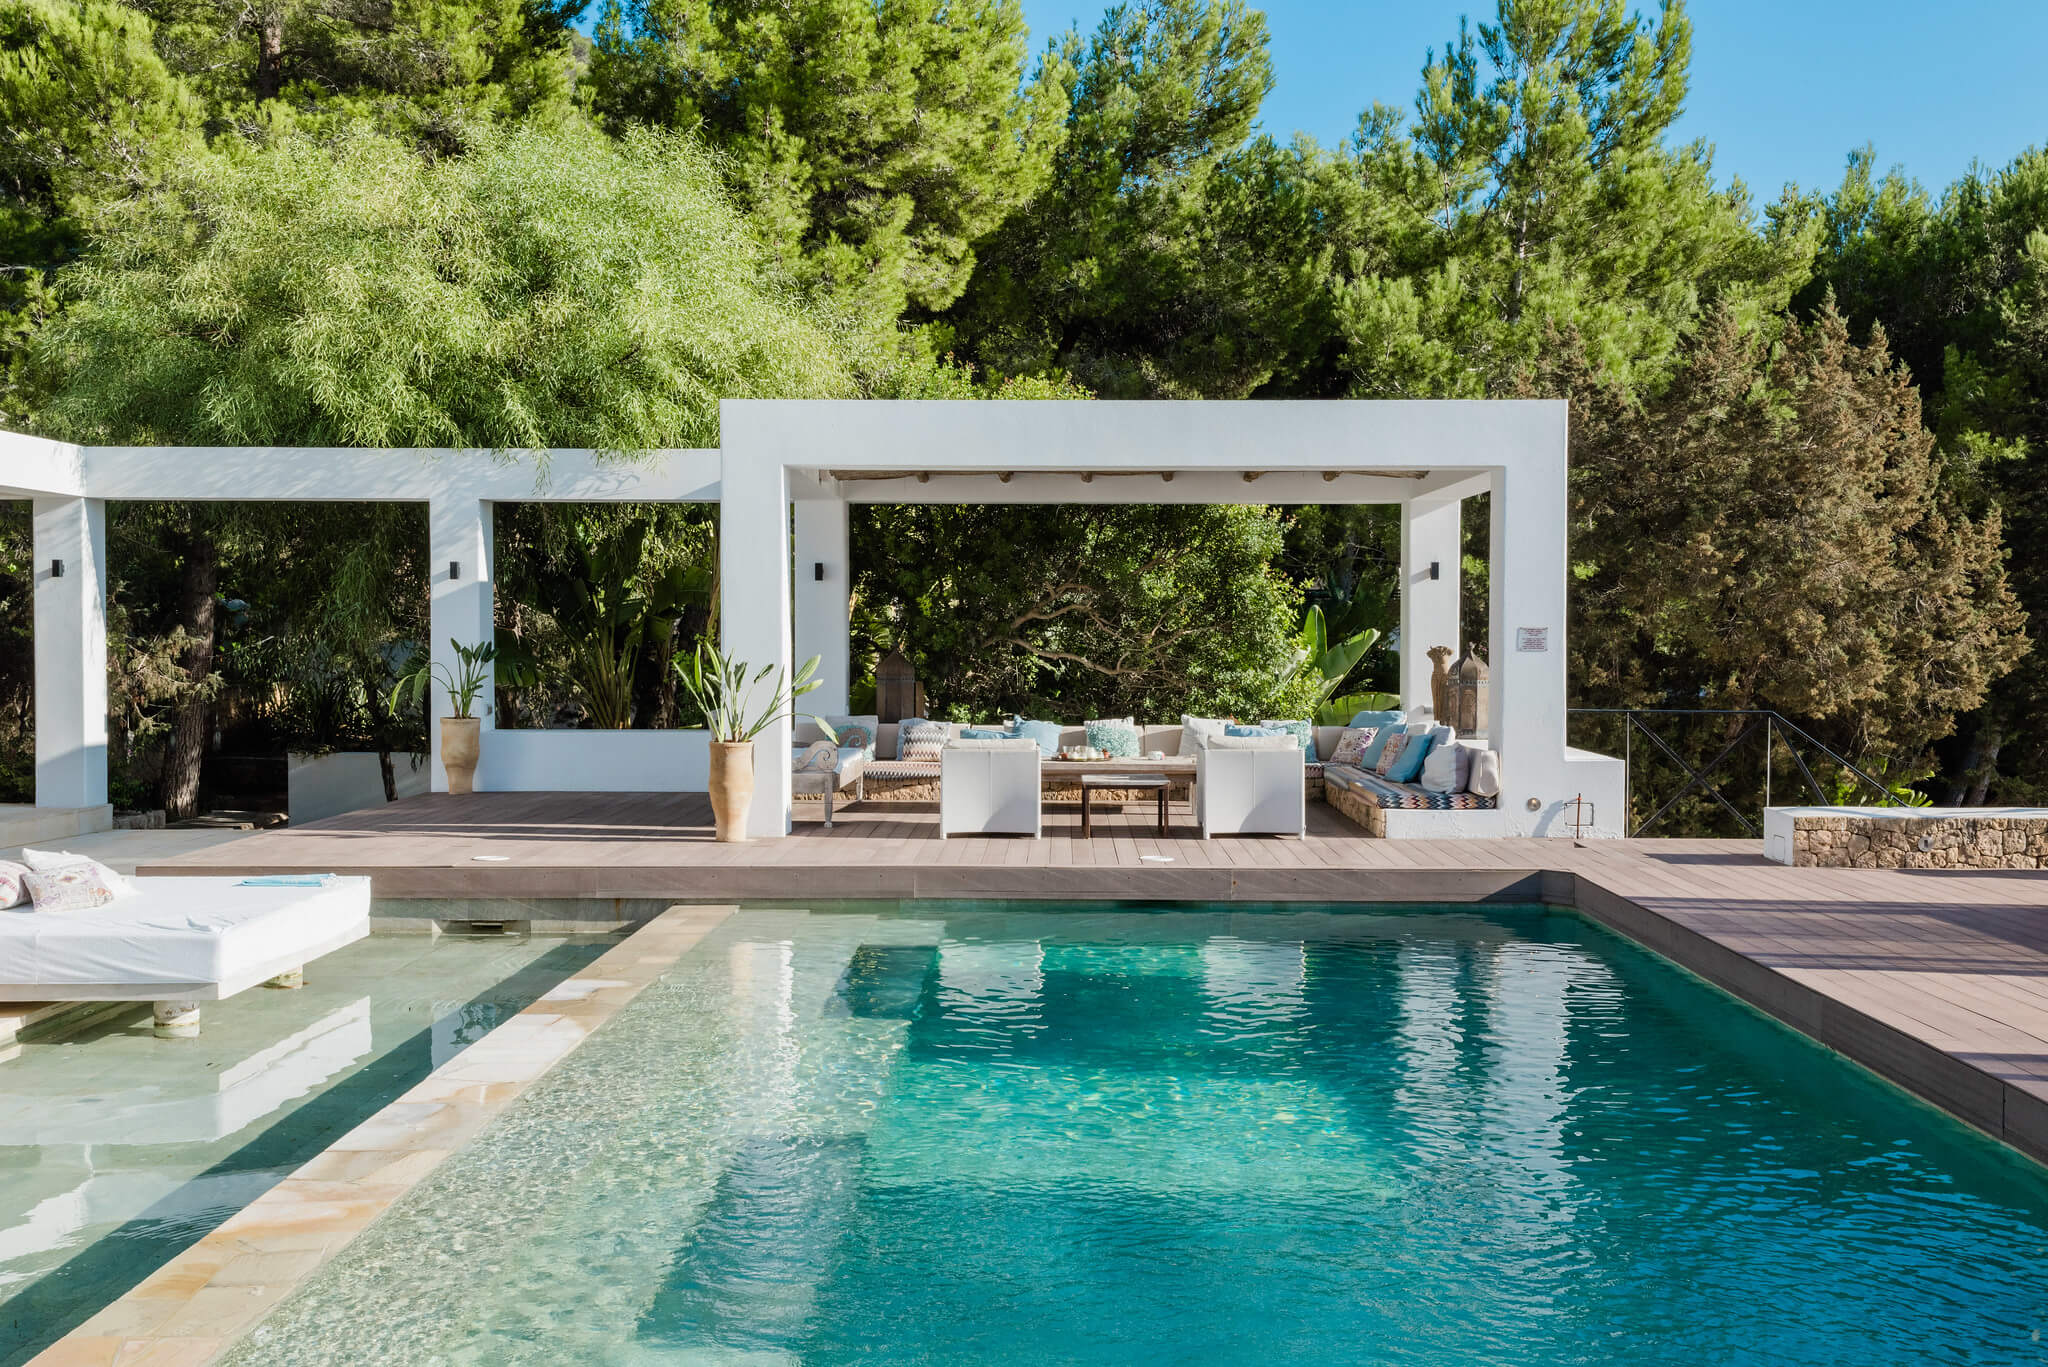 https://www.white-ibiza.com/wp-content/uploads/2020/05/white-ibiza-villas-casa-amalia-exterior-looking-across.jpg